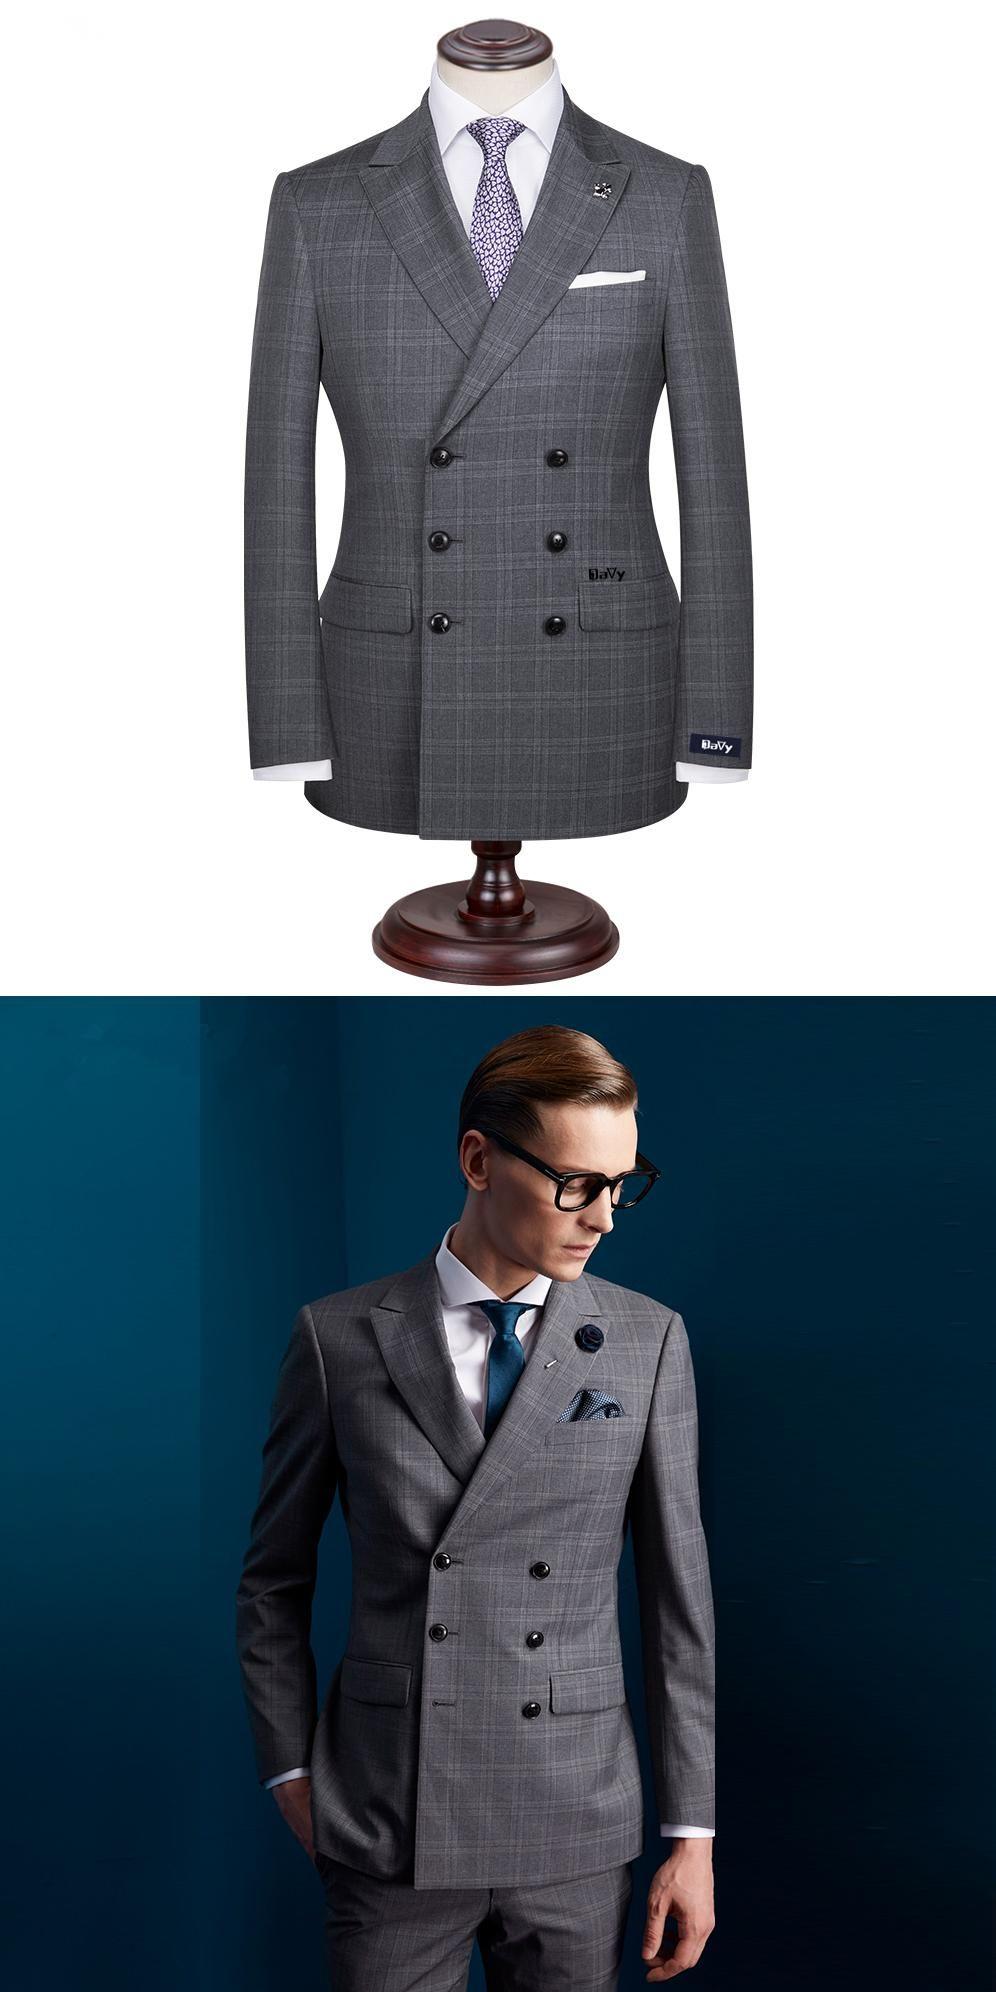 Custom Made Men\'s Wedding Suits Groom Tuxedos Jacket+Pant+Tie Formal ...